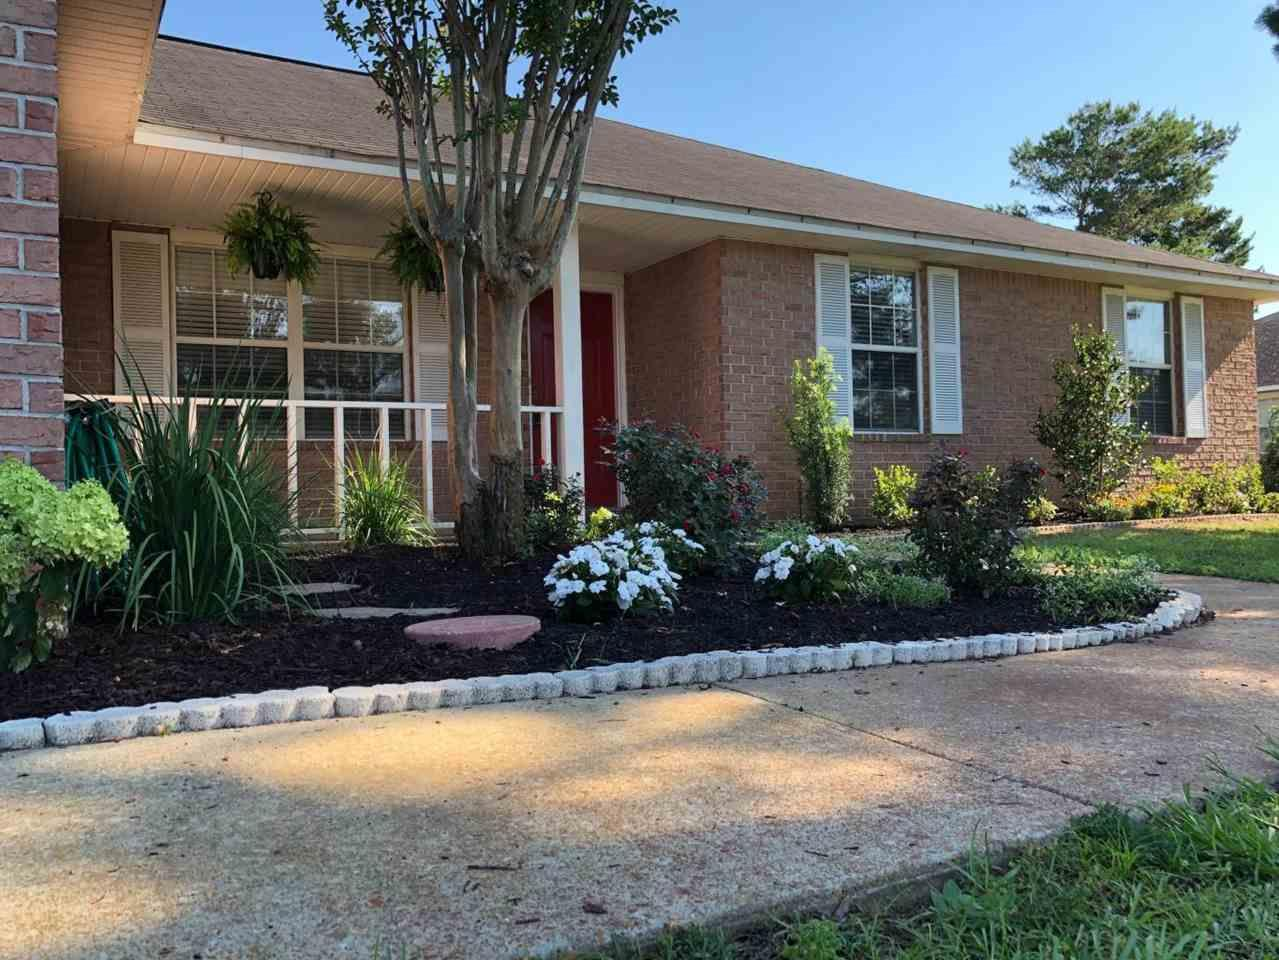 541 Batten Blvd, Pensacola, FL 32507